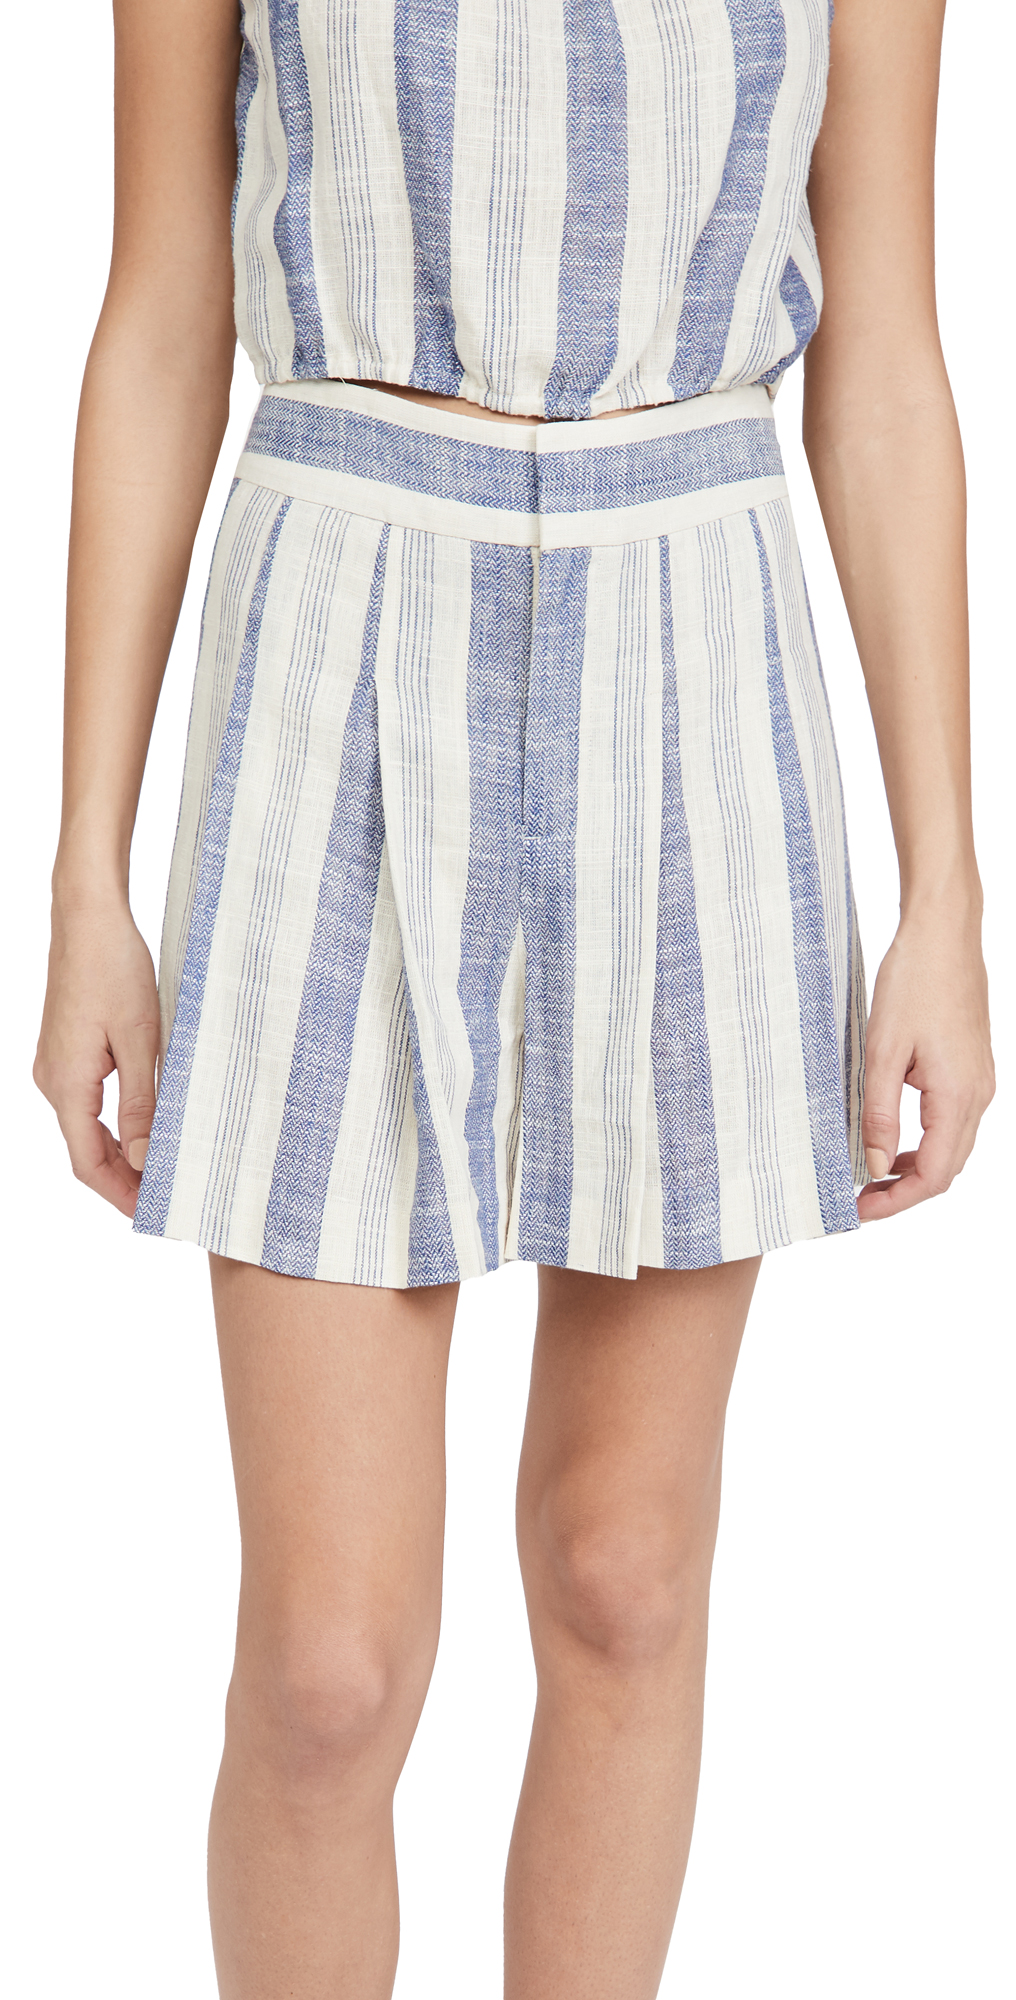 alice + olivia Scarlet Clean Waistband Flutter Shorts